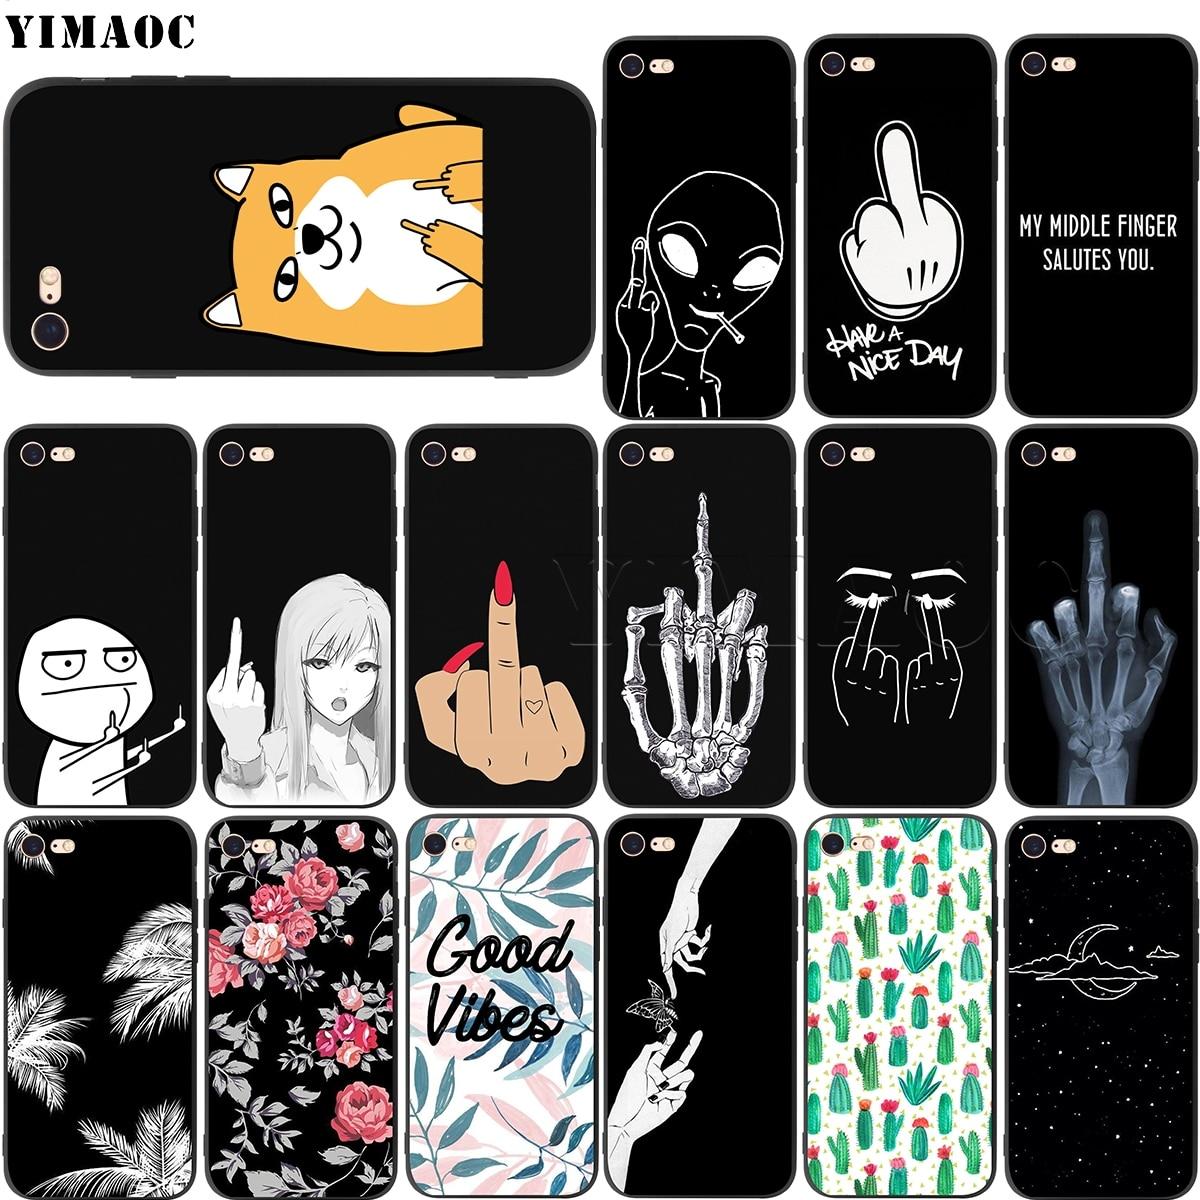 Yimaoc capa de silicone meio dedo, desenho animado para iphone 11 pro xs max xr x 8 7 6 6s plus 5 5S se